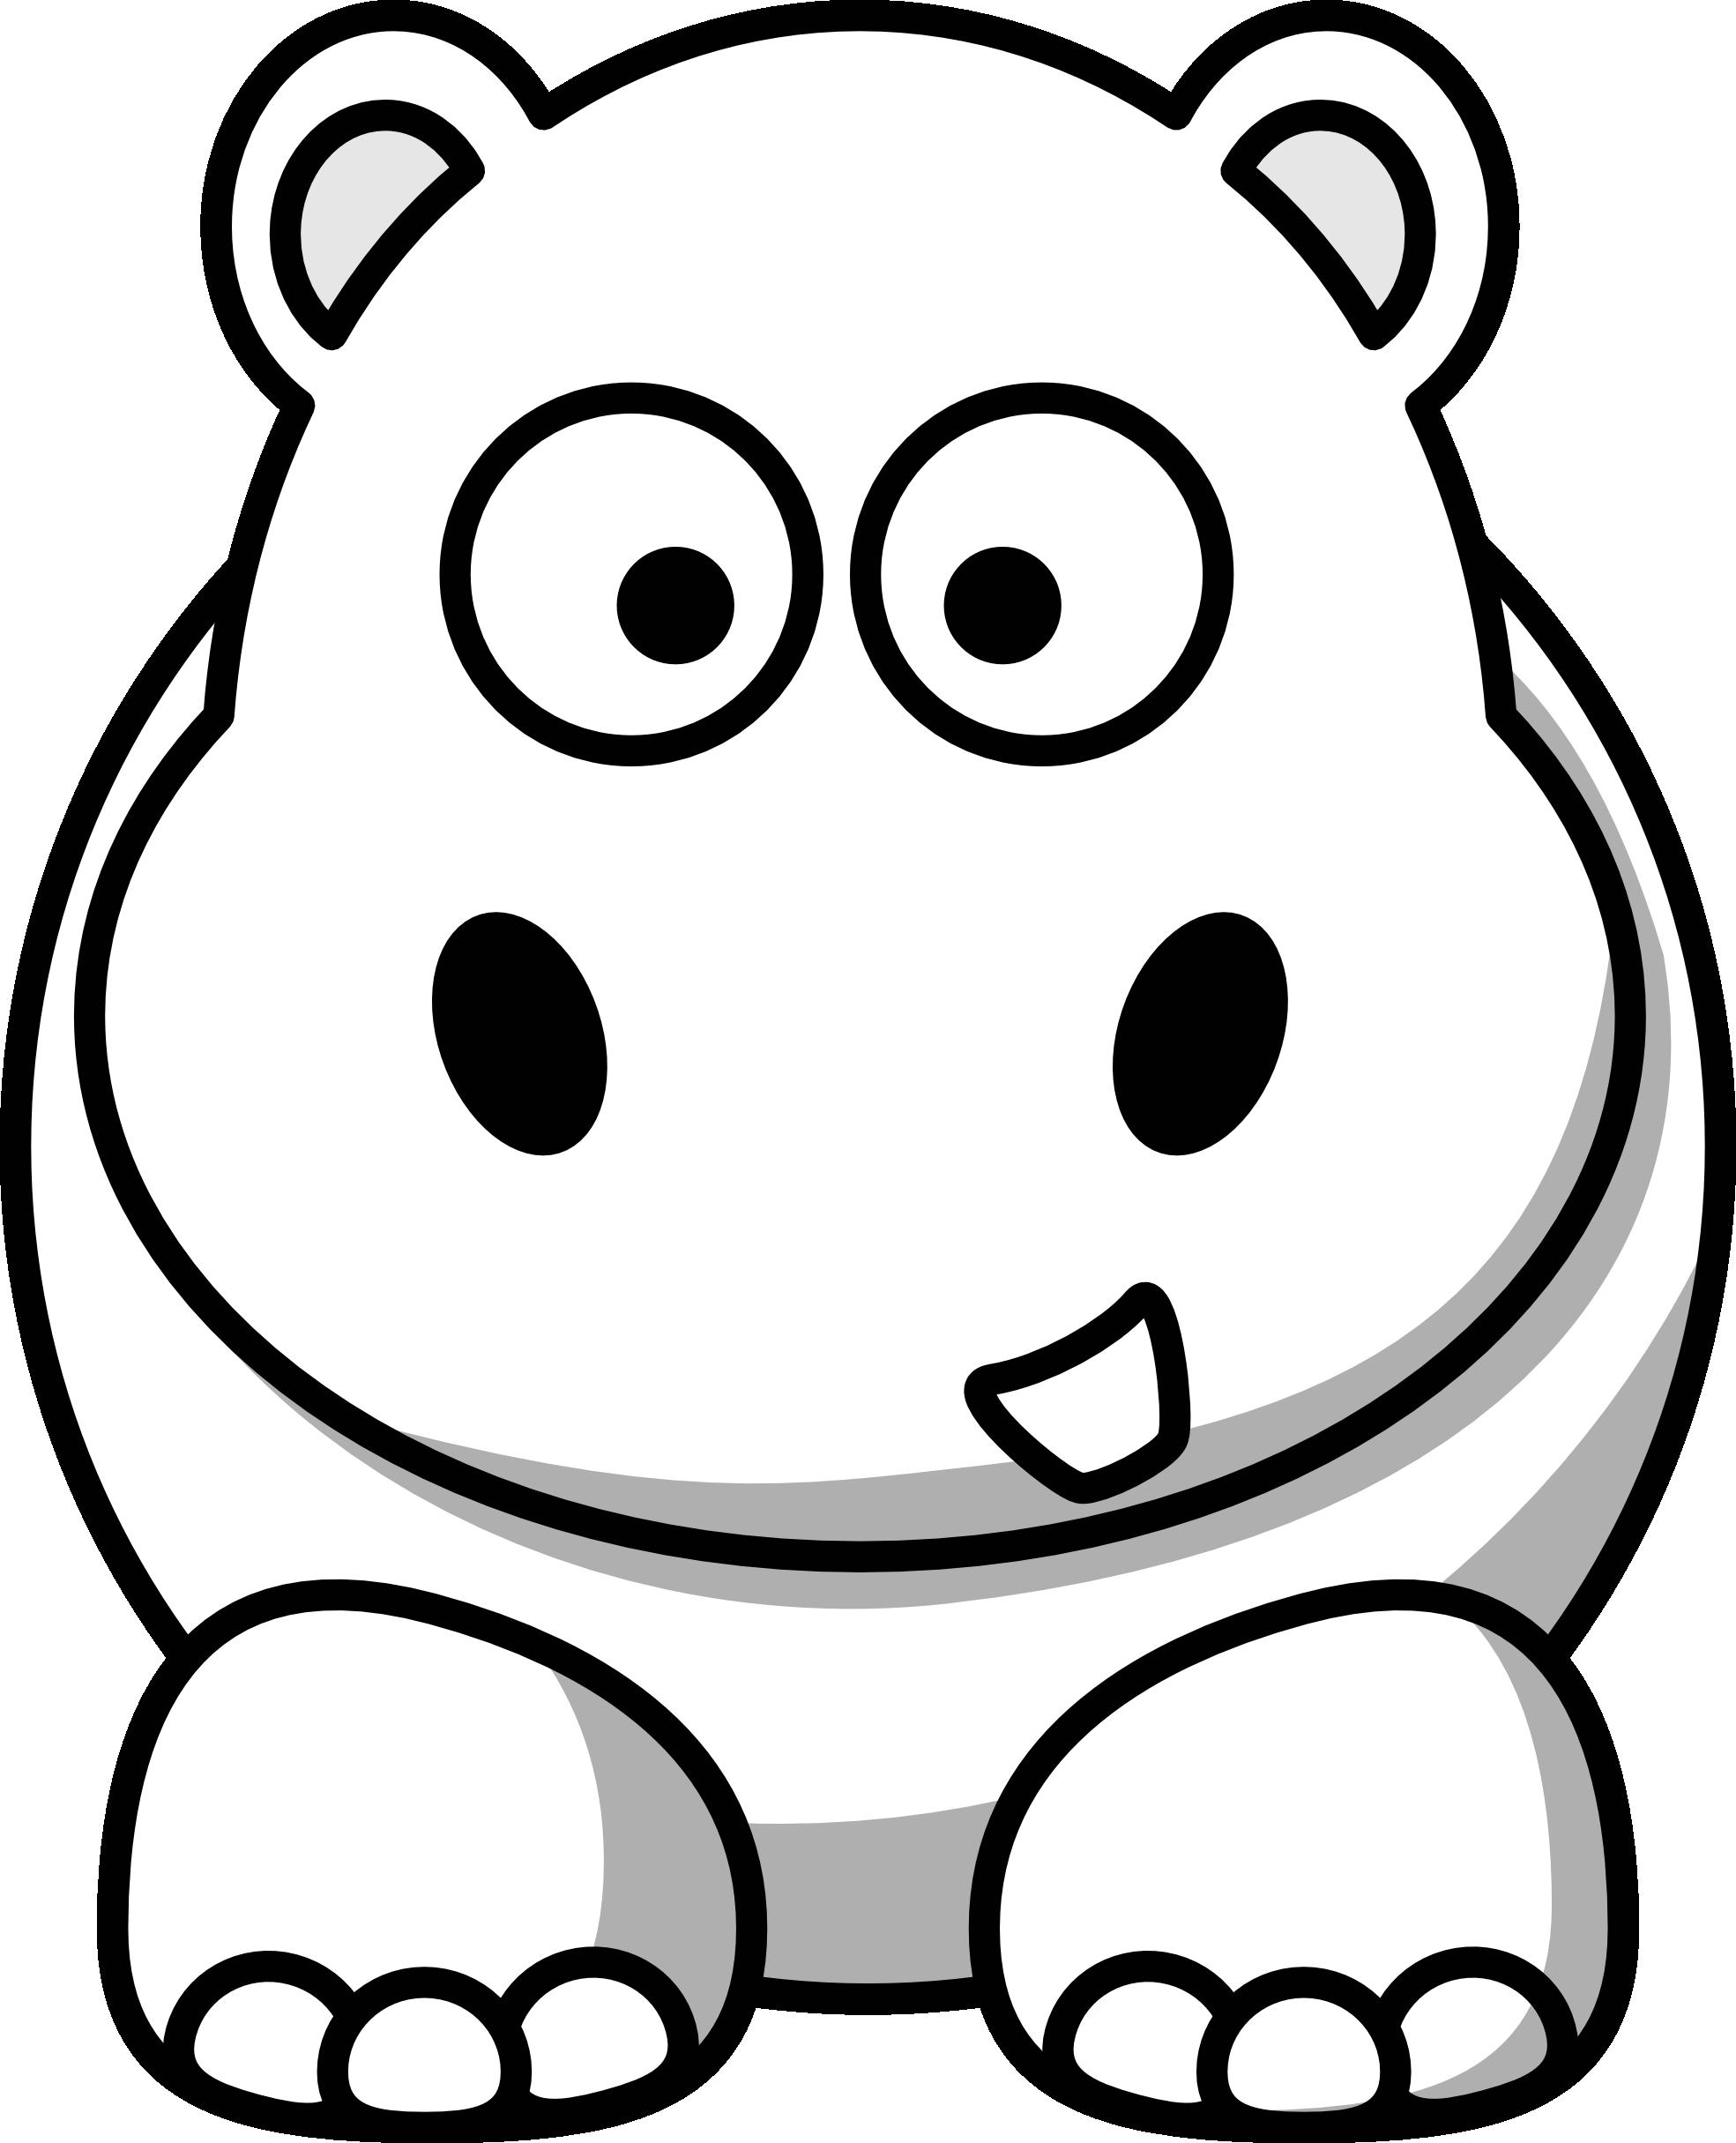 Black and white clip art svg freeuse download Black and White Clip Art – Clipart Free Download svg freeuse download